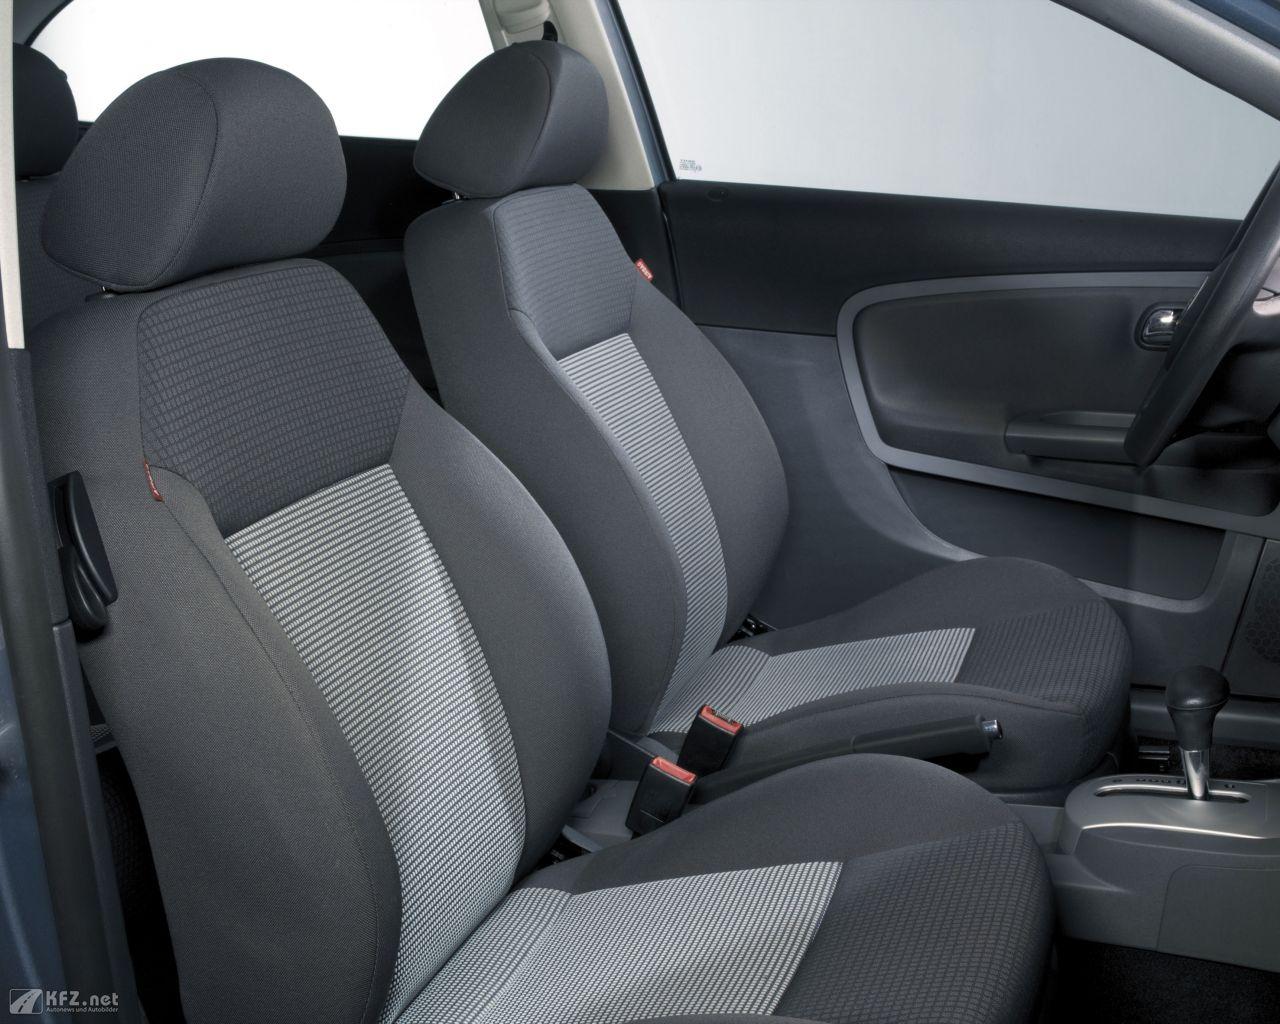 seat-cordoba-1280x1024-5